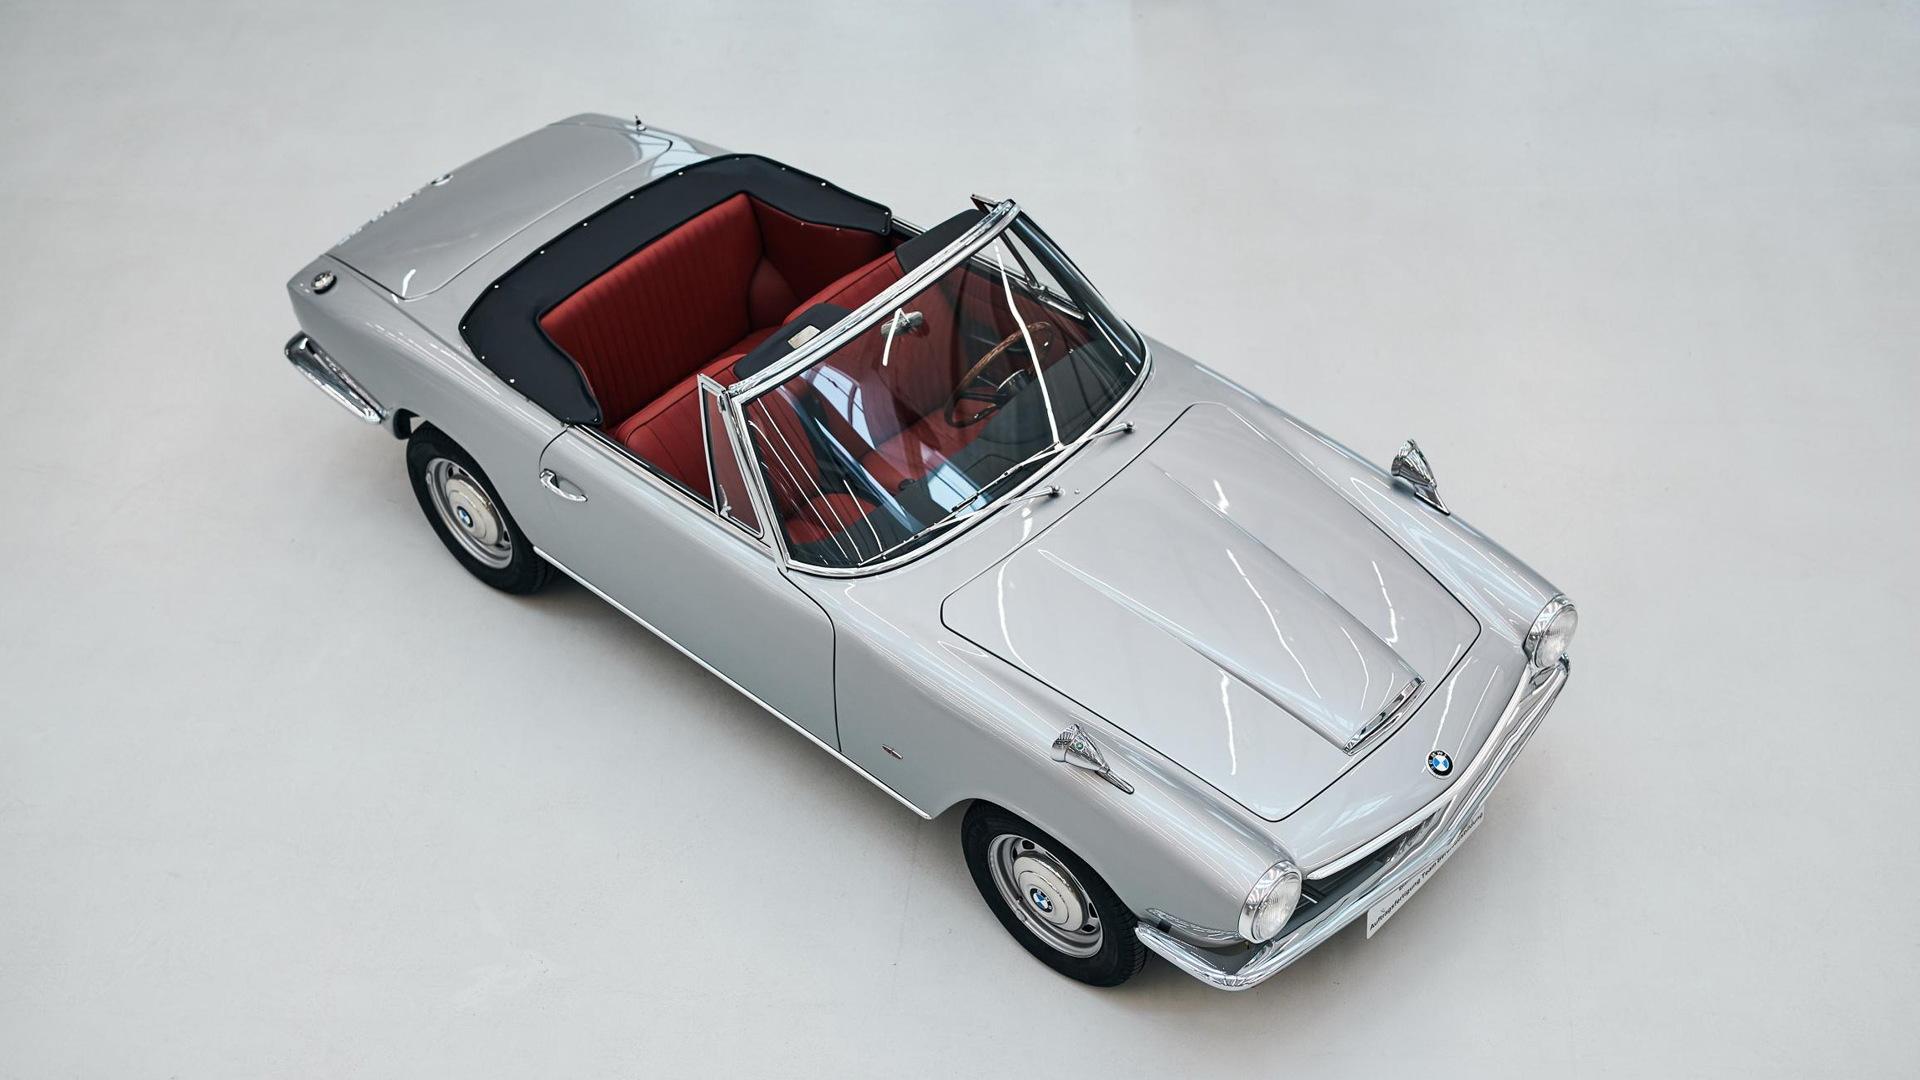 1967 BMW 1600 GT Convertible prototype